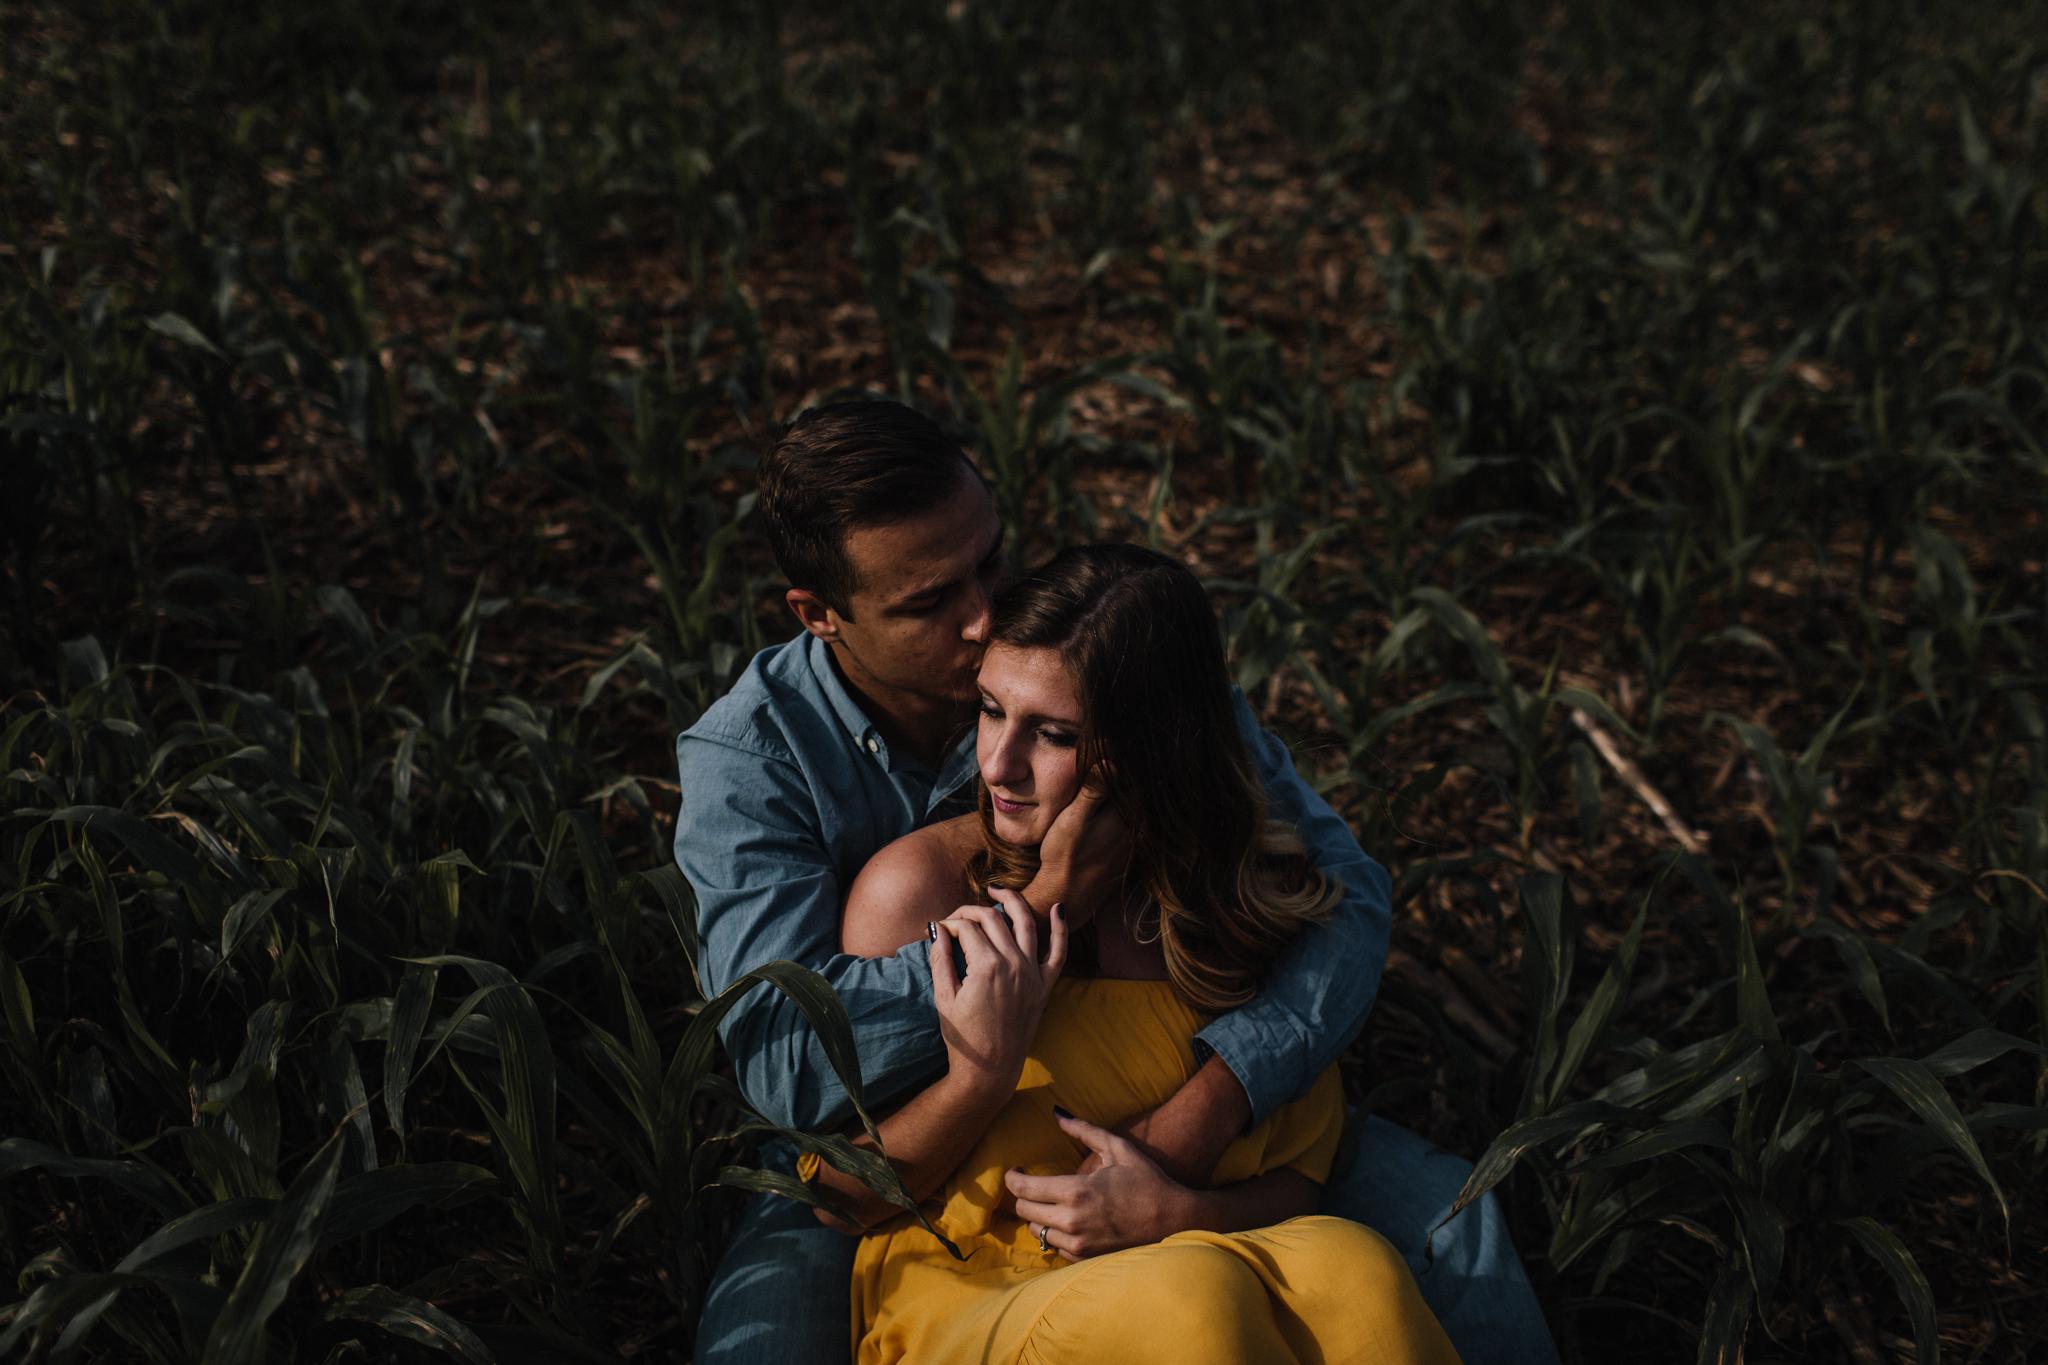 billie-shaye-style-photography-www.billieshayestyle.com-harsh-light-couples-session-nashville-tennessee-7214.jpg